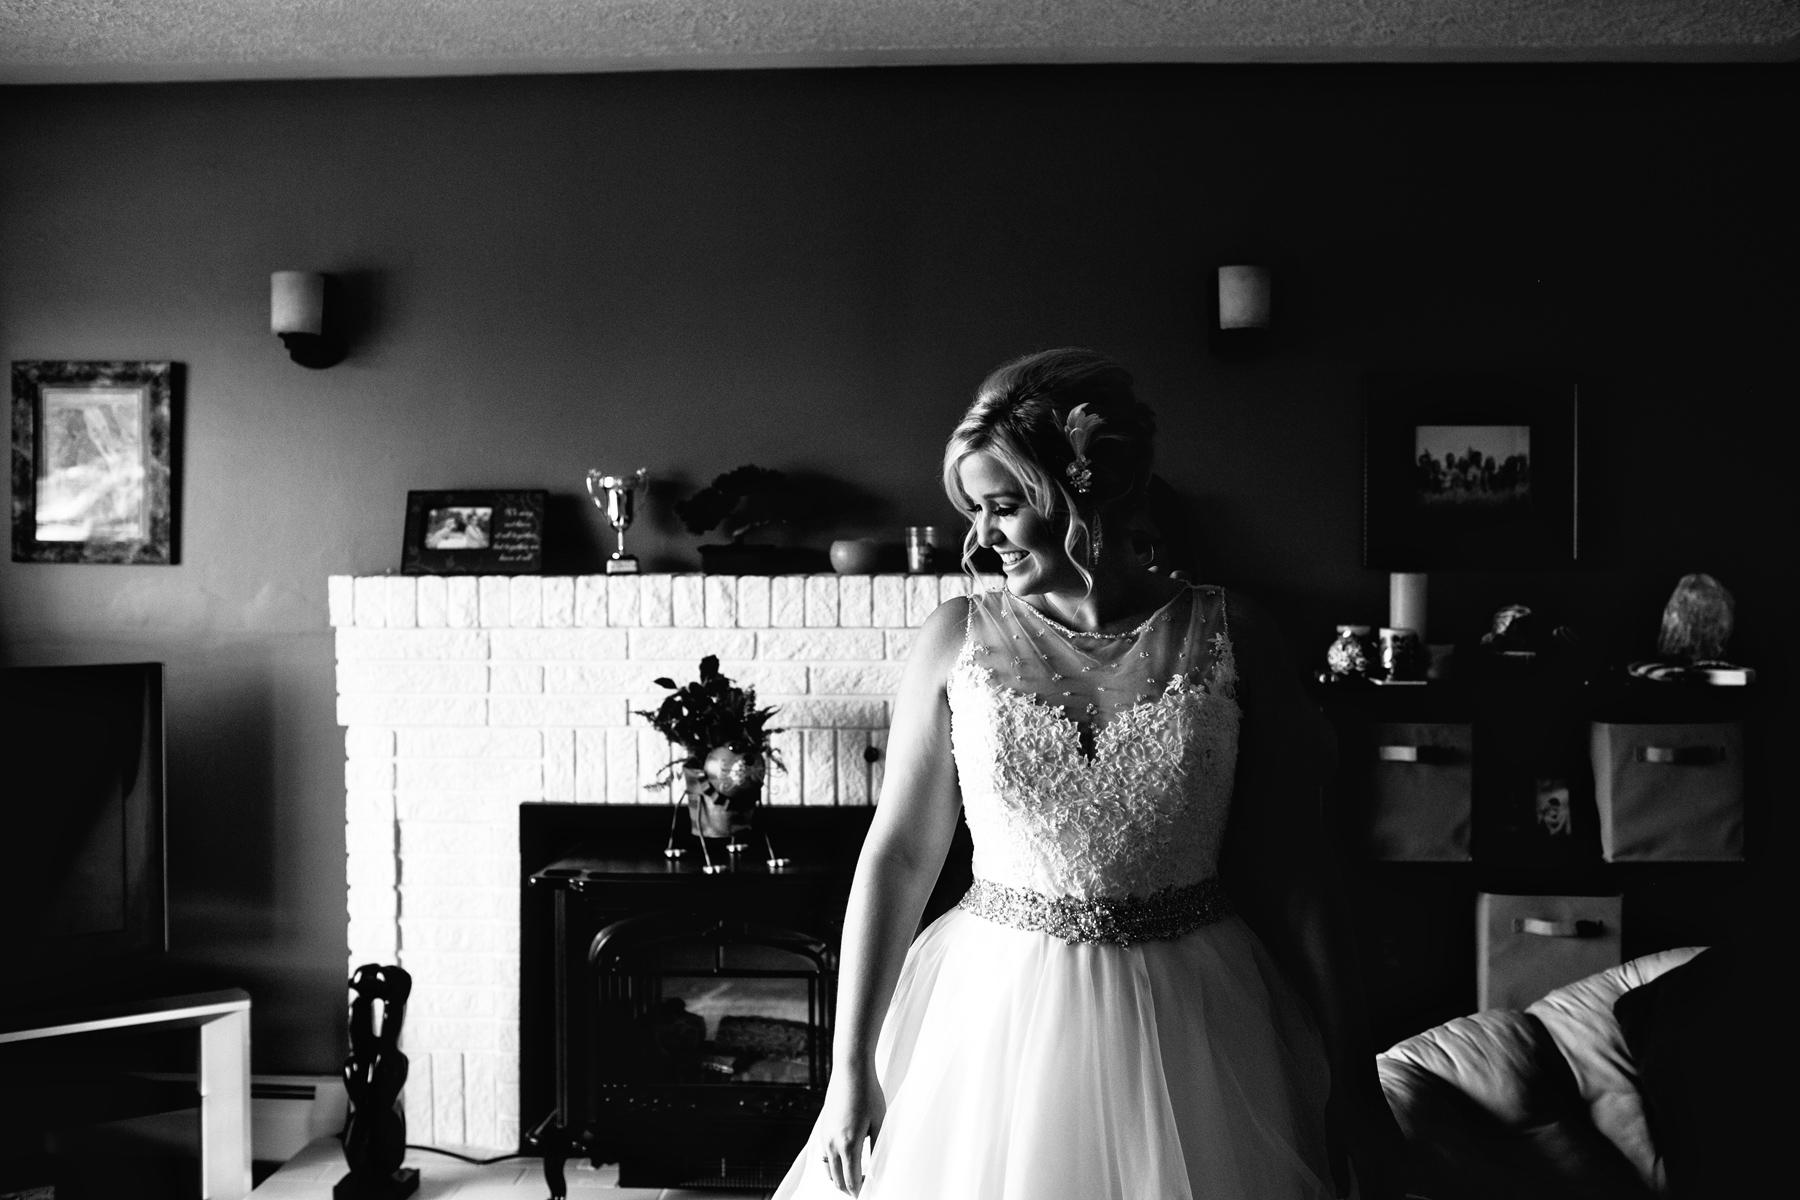 005-awesome-pei-wedding-photography-kandisebrown-jg2016